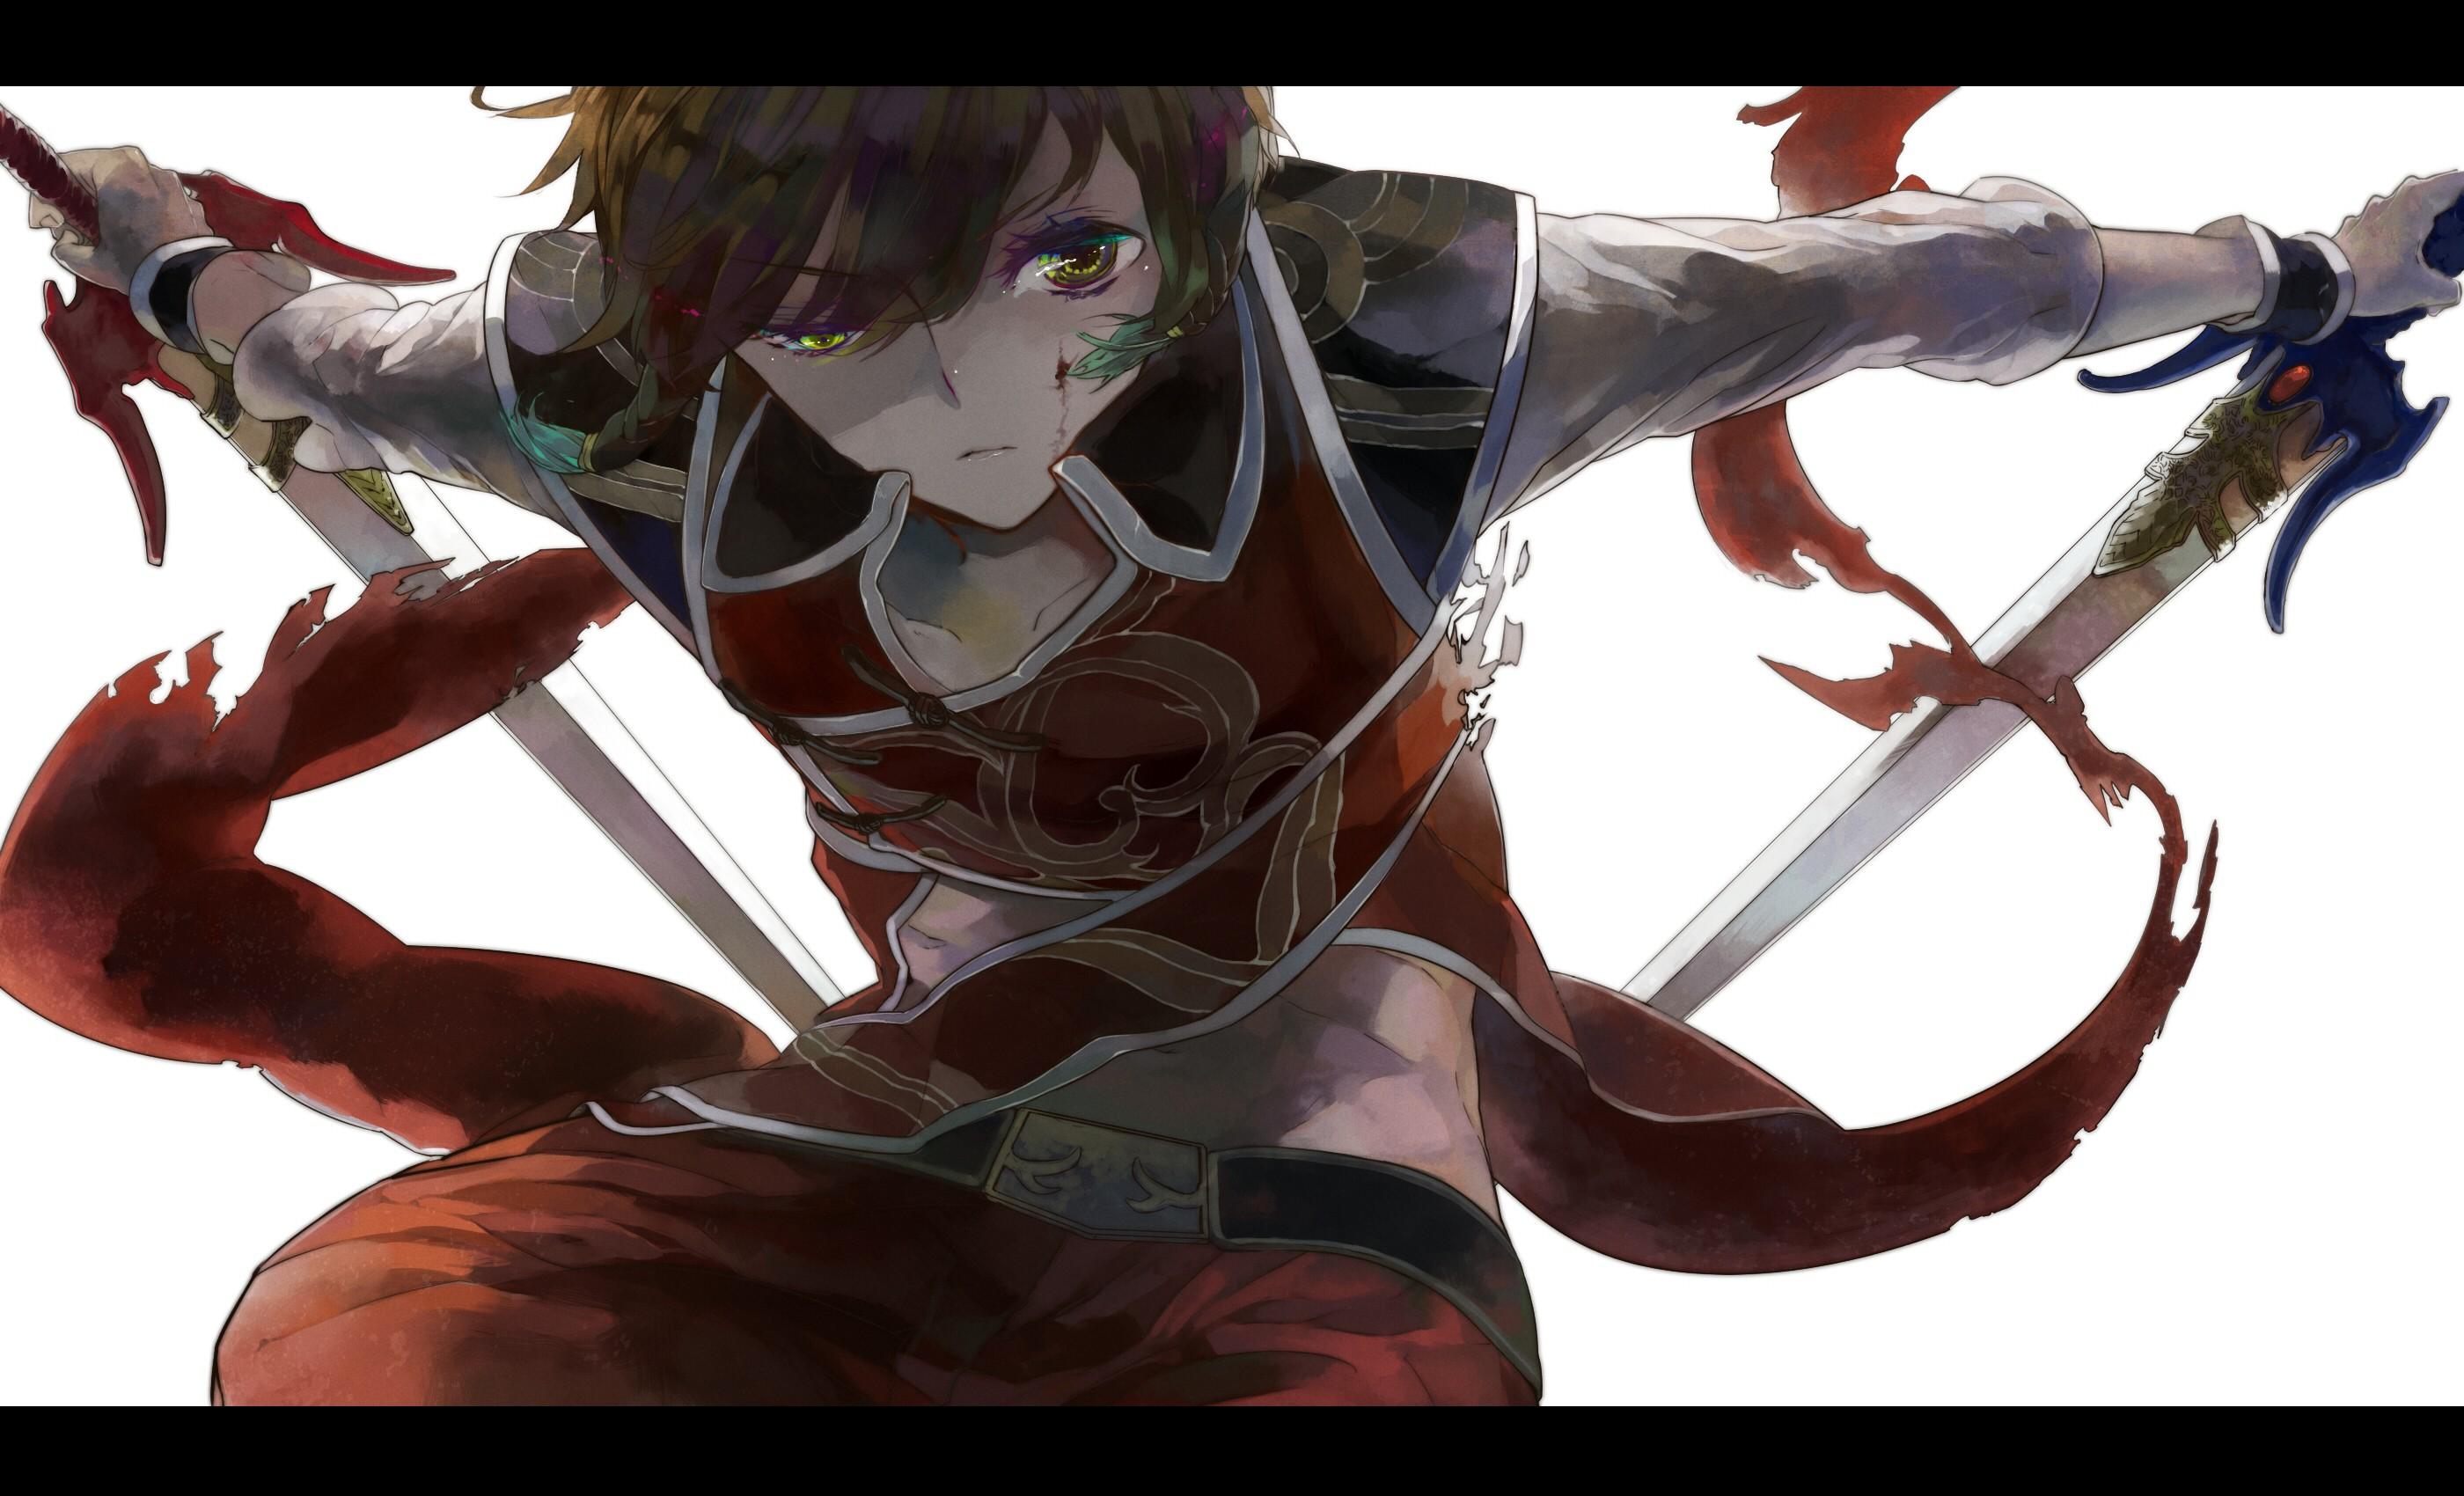 Anime Boys Swords Wallpaper 2800x1700 213029 Wallpaperup